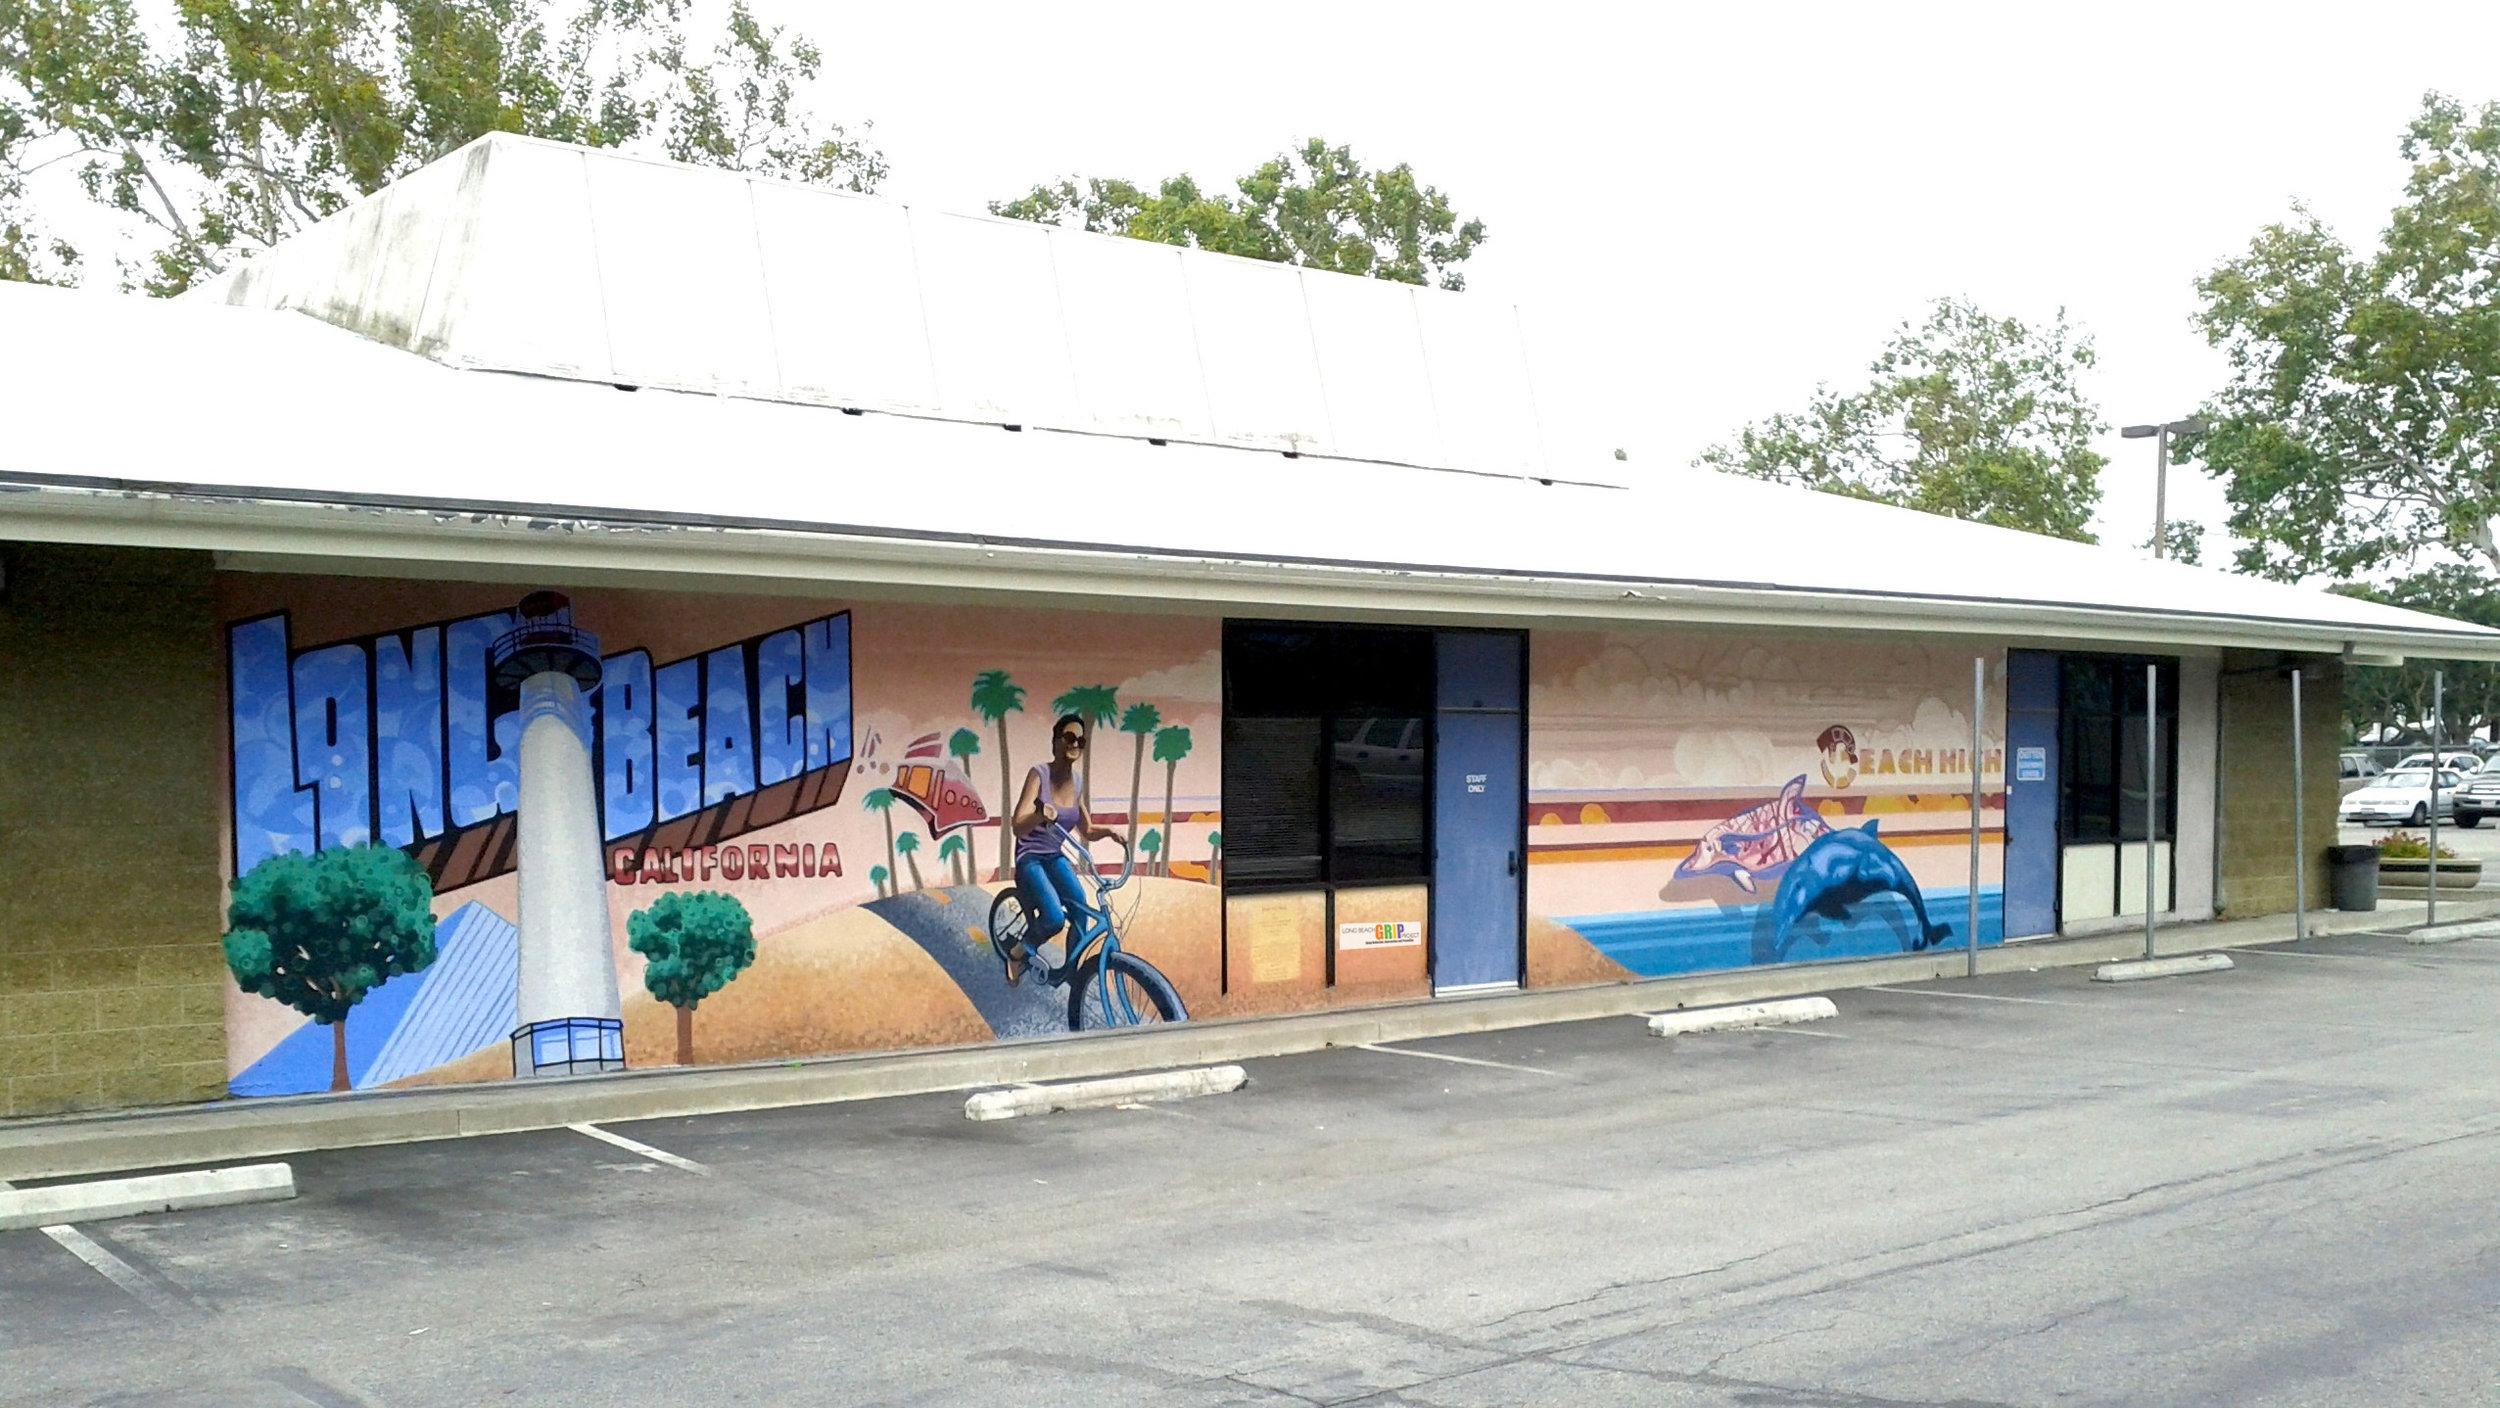 BEACH HIGH SCHOOL MURAL.jpg